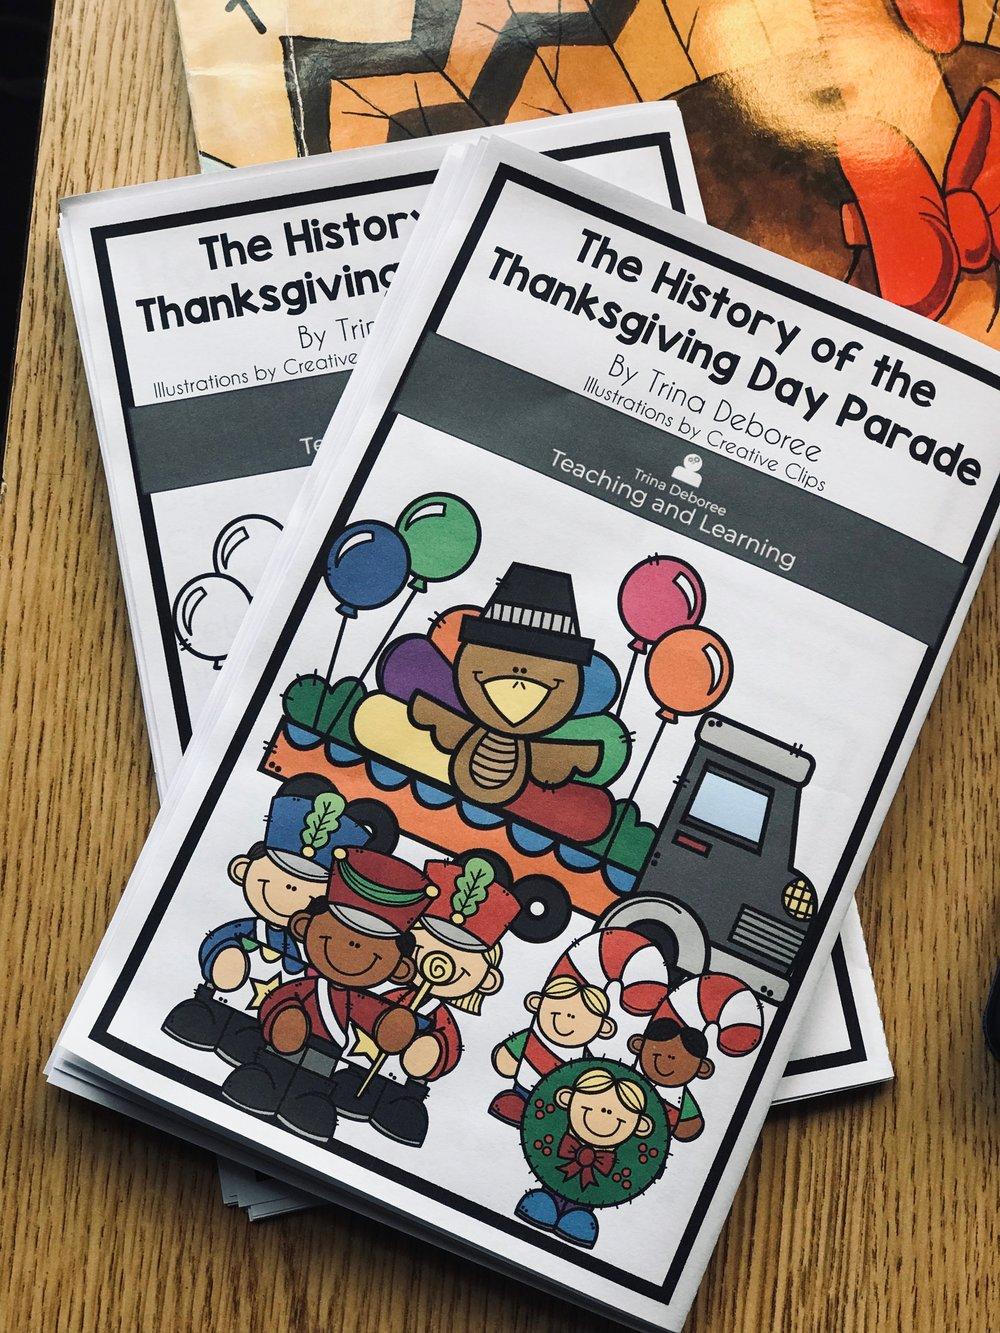 Thanksgiving nonfiction reader. #standards #thanksgivingparadehistory